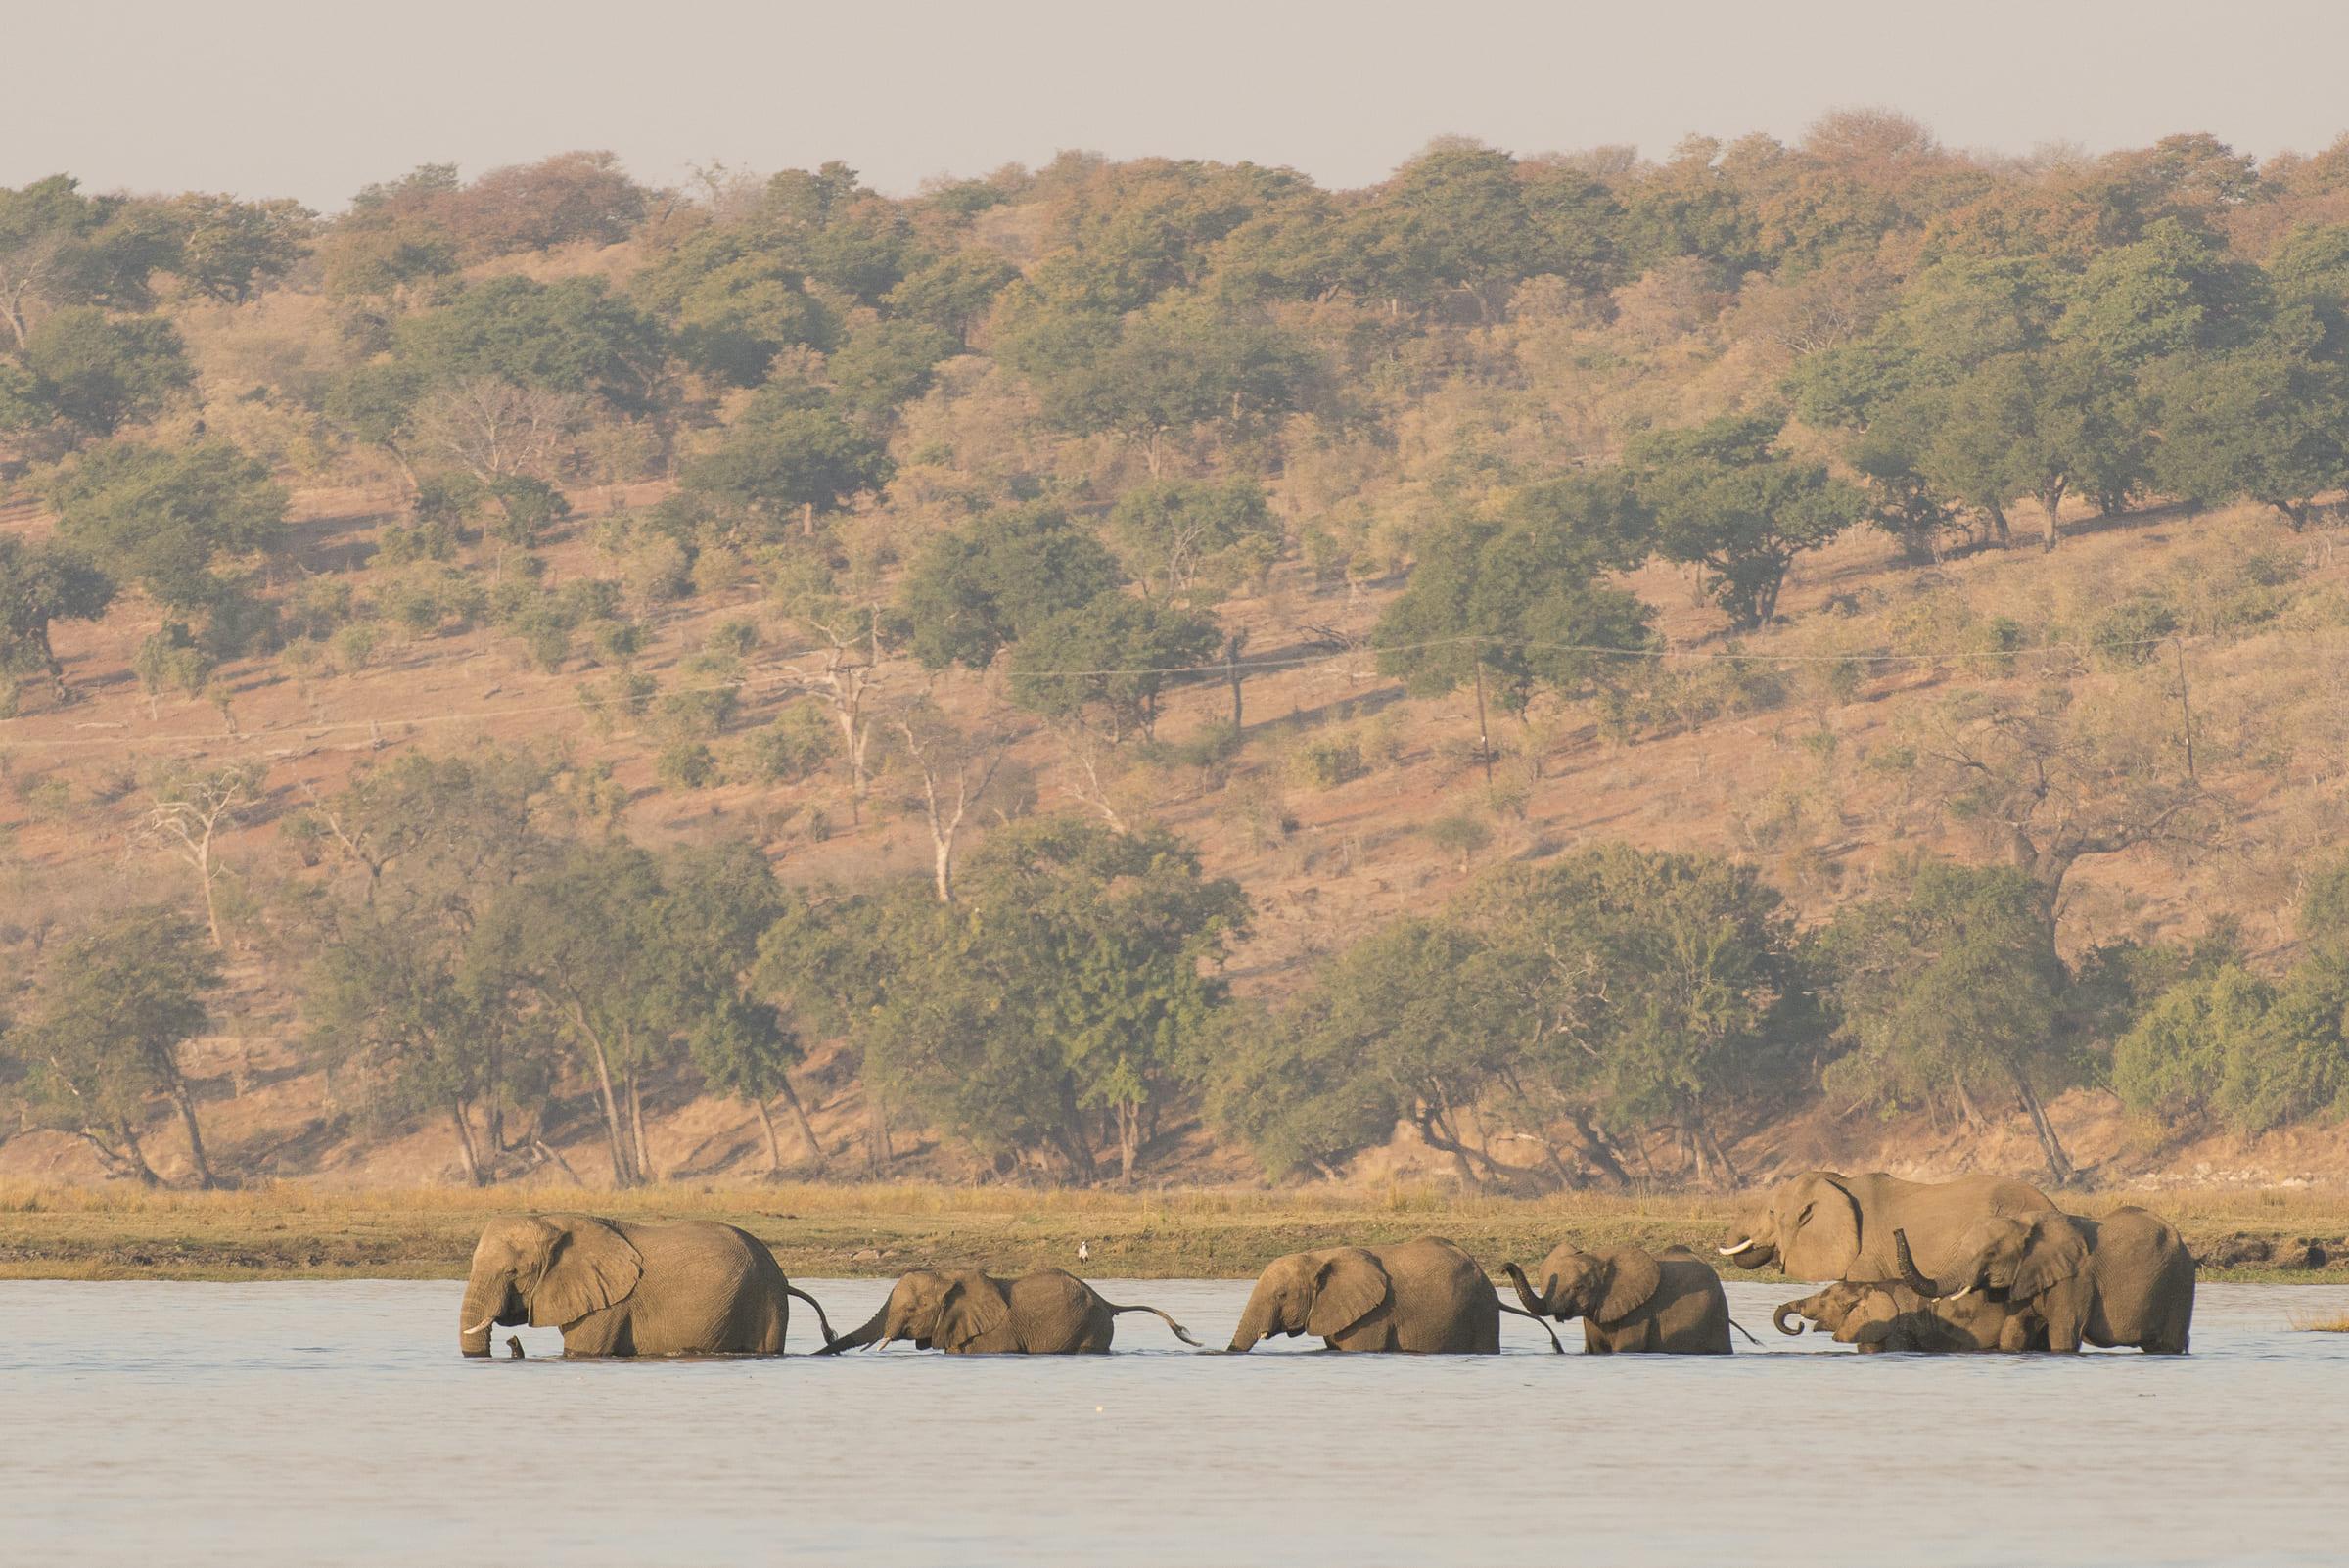 Afrikanische Elefanten durchqueren einen Fluss